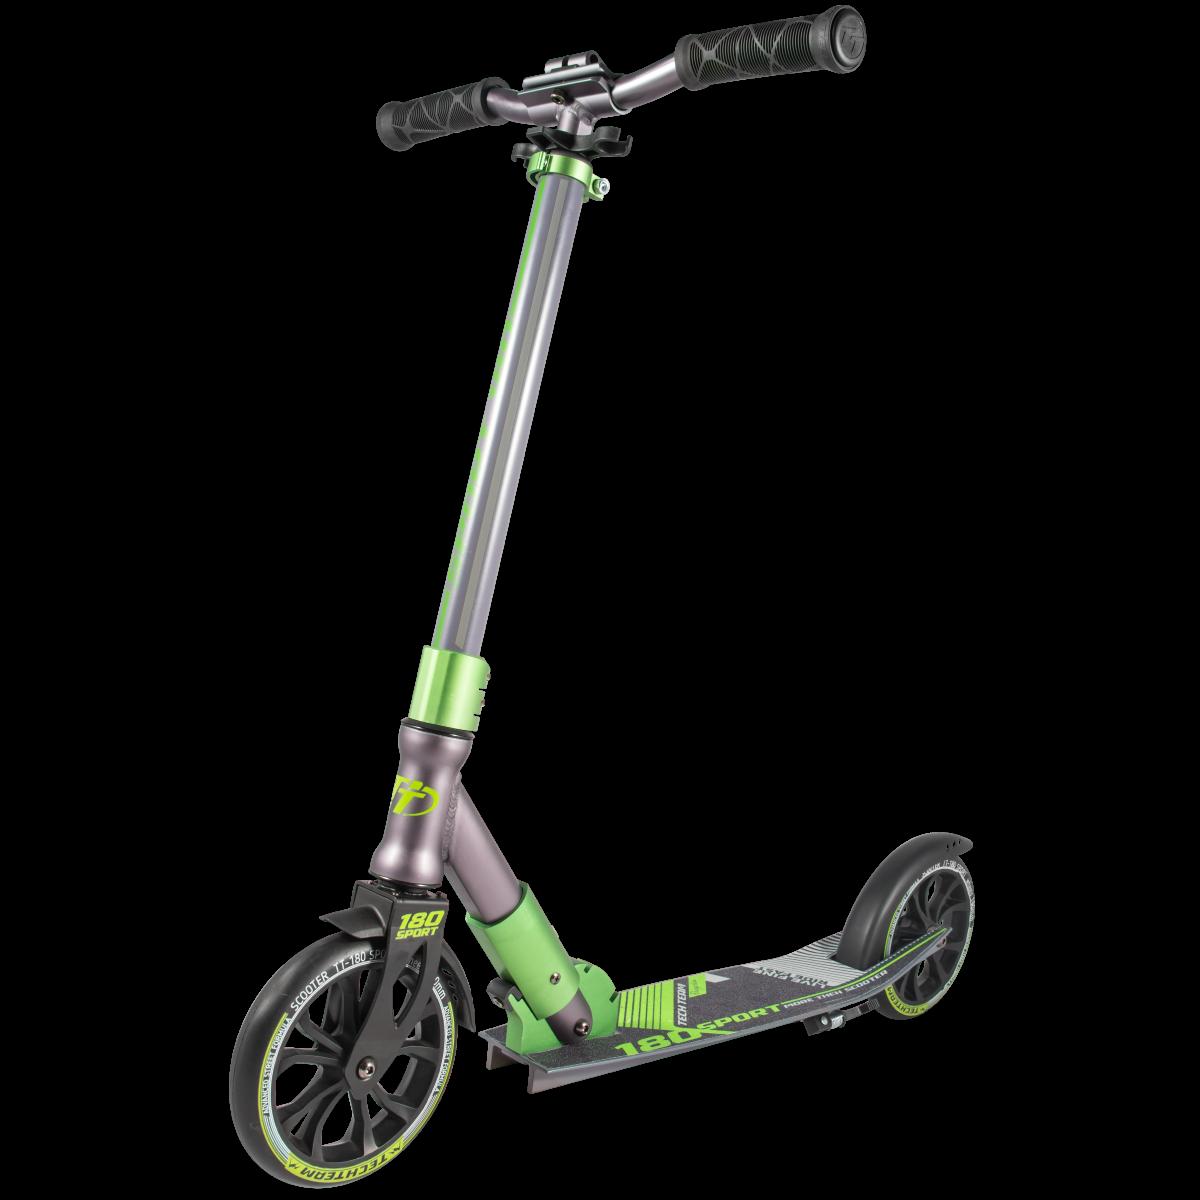 Самокат TechTeam 180 Sport 2019 зеленый